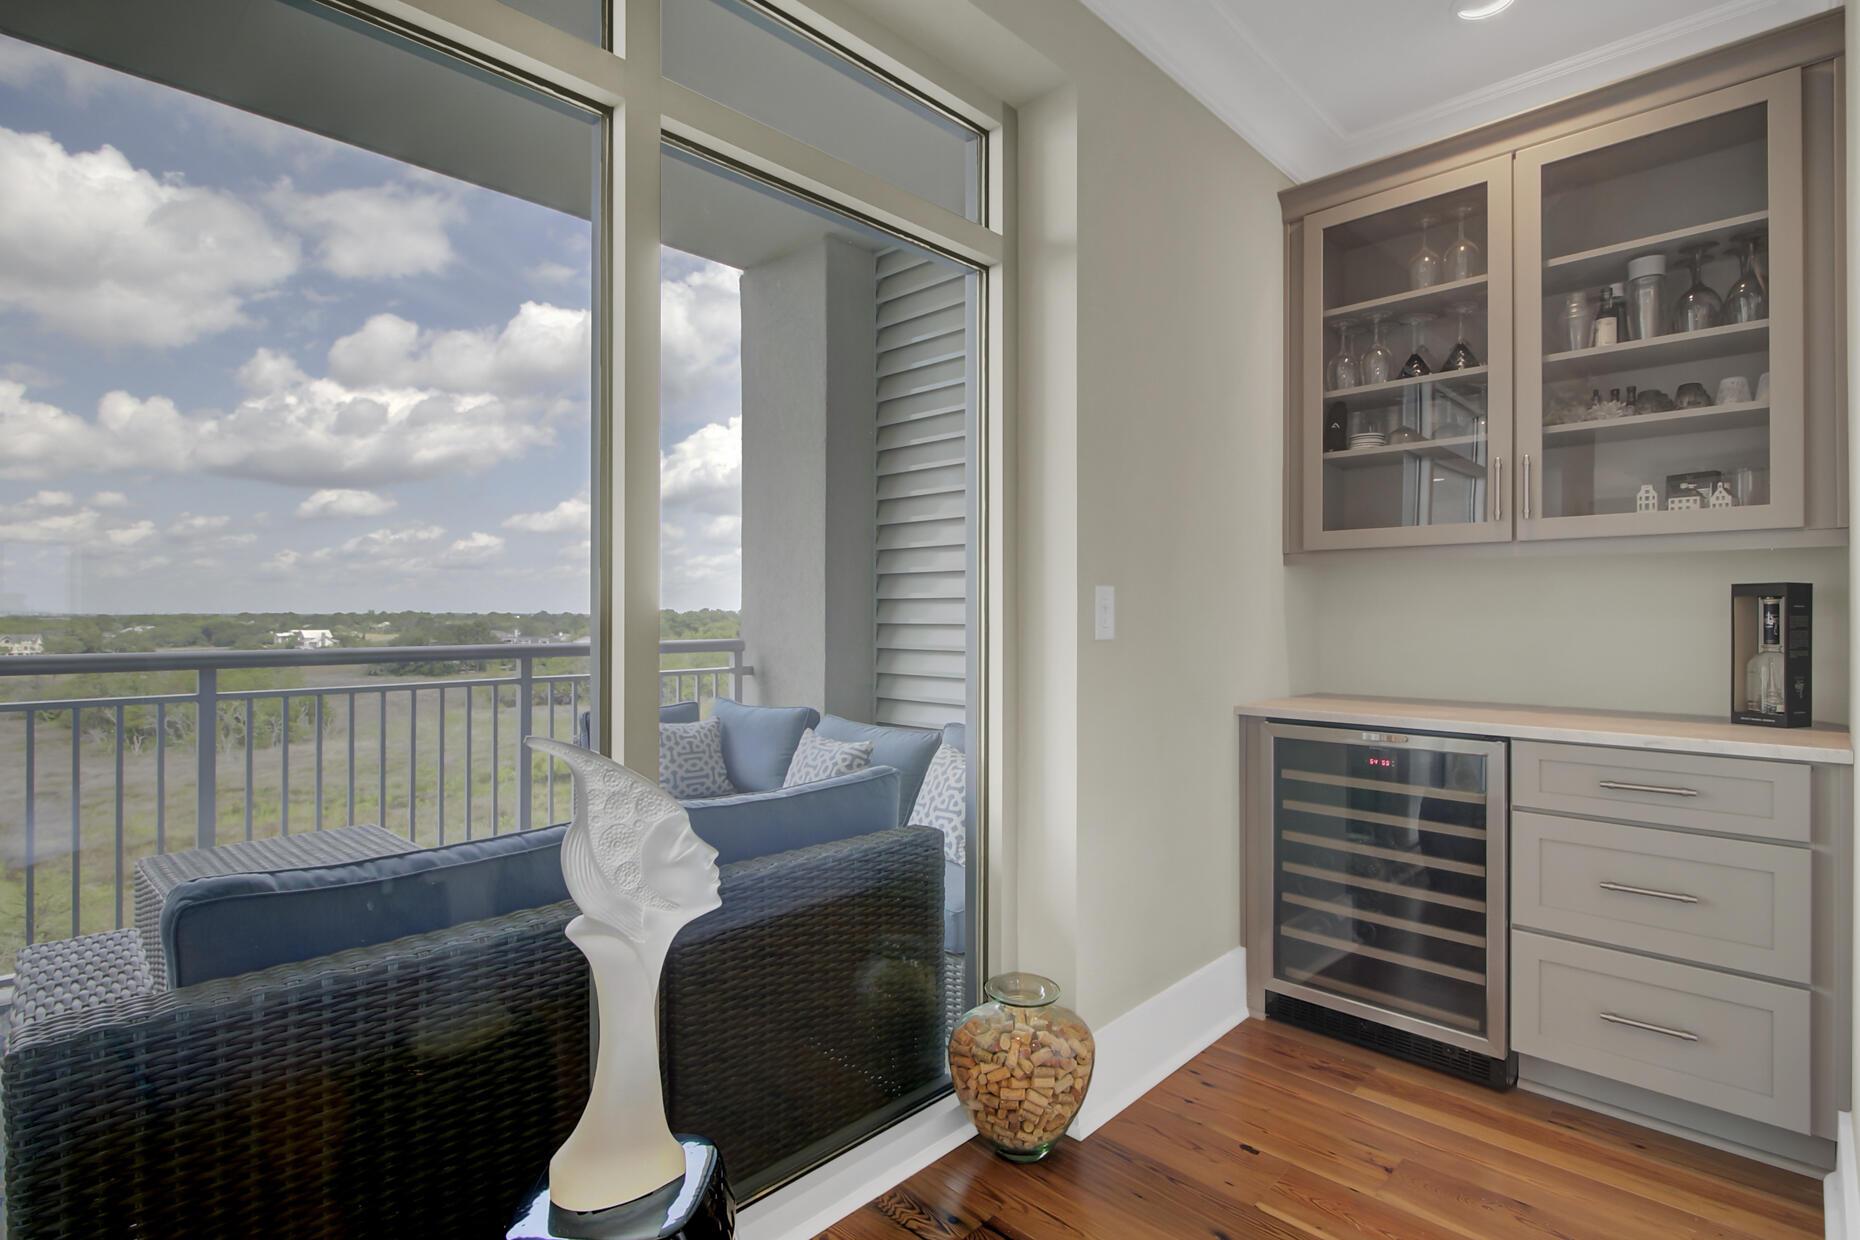 Tides IV Condominiums Homes For Sale - 155 Wingo Way, Mount Pleasant, SC - 1